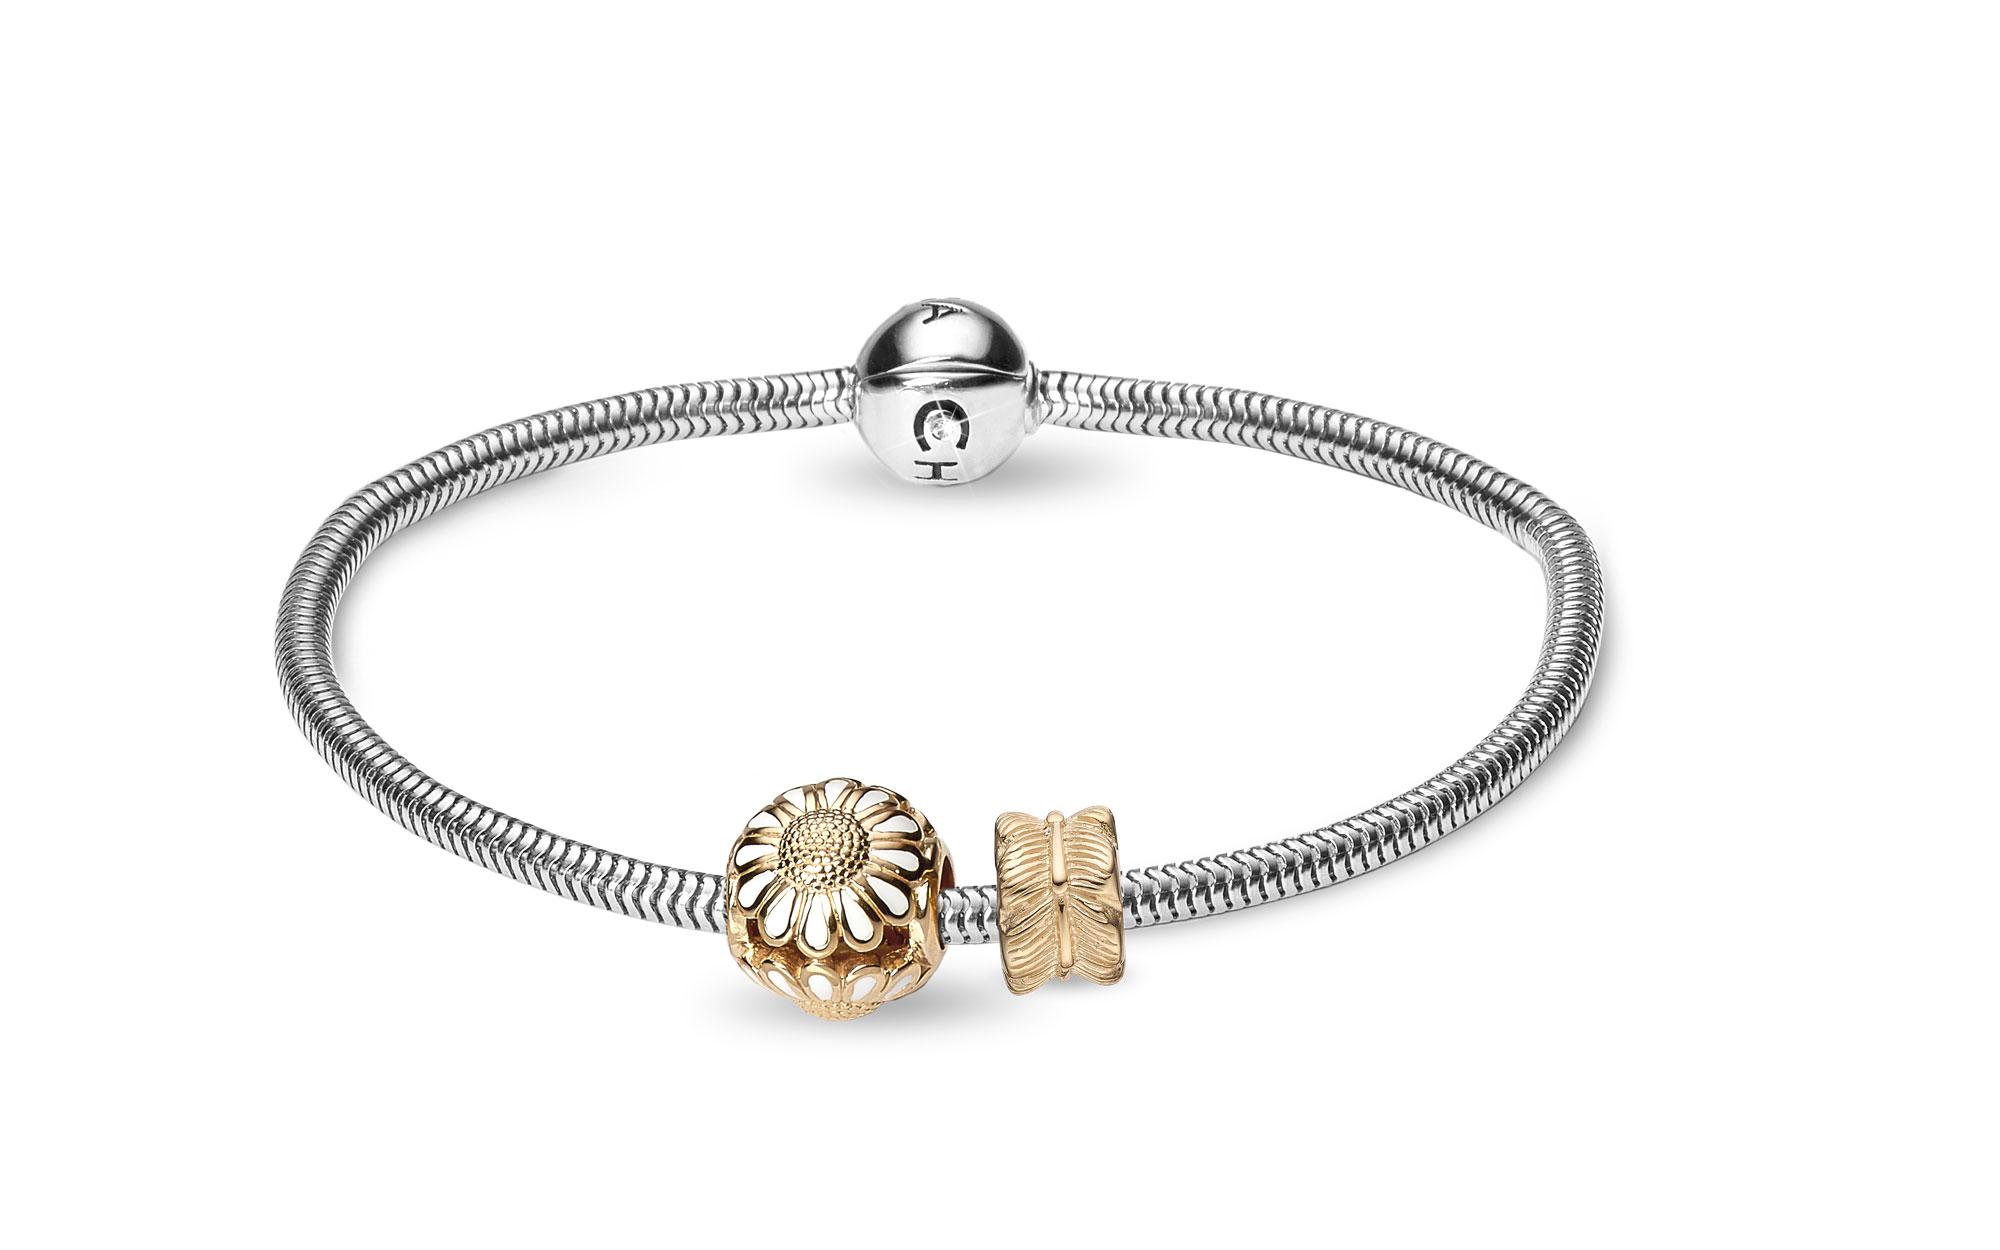 Image of CHRISTINA Silver Bracelet Kampagne - 615-G 17 centimeter